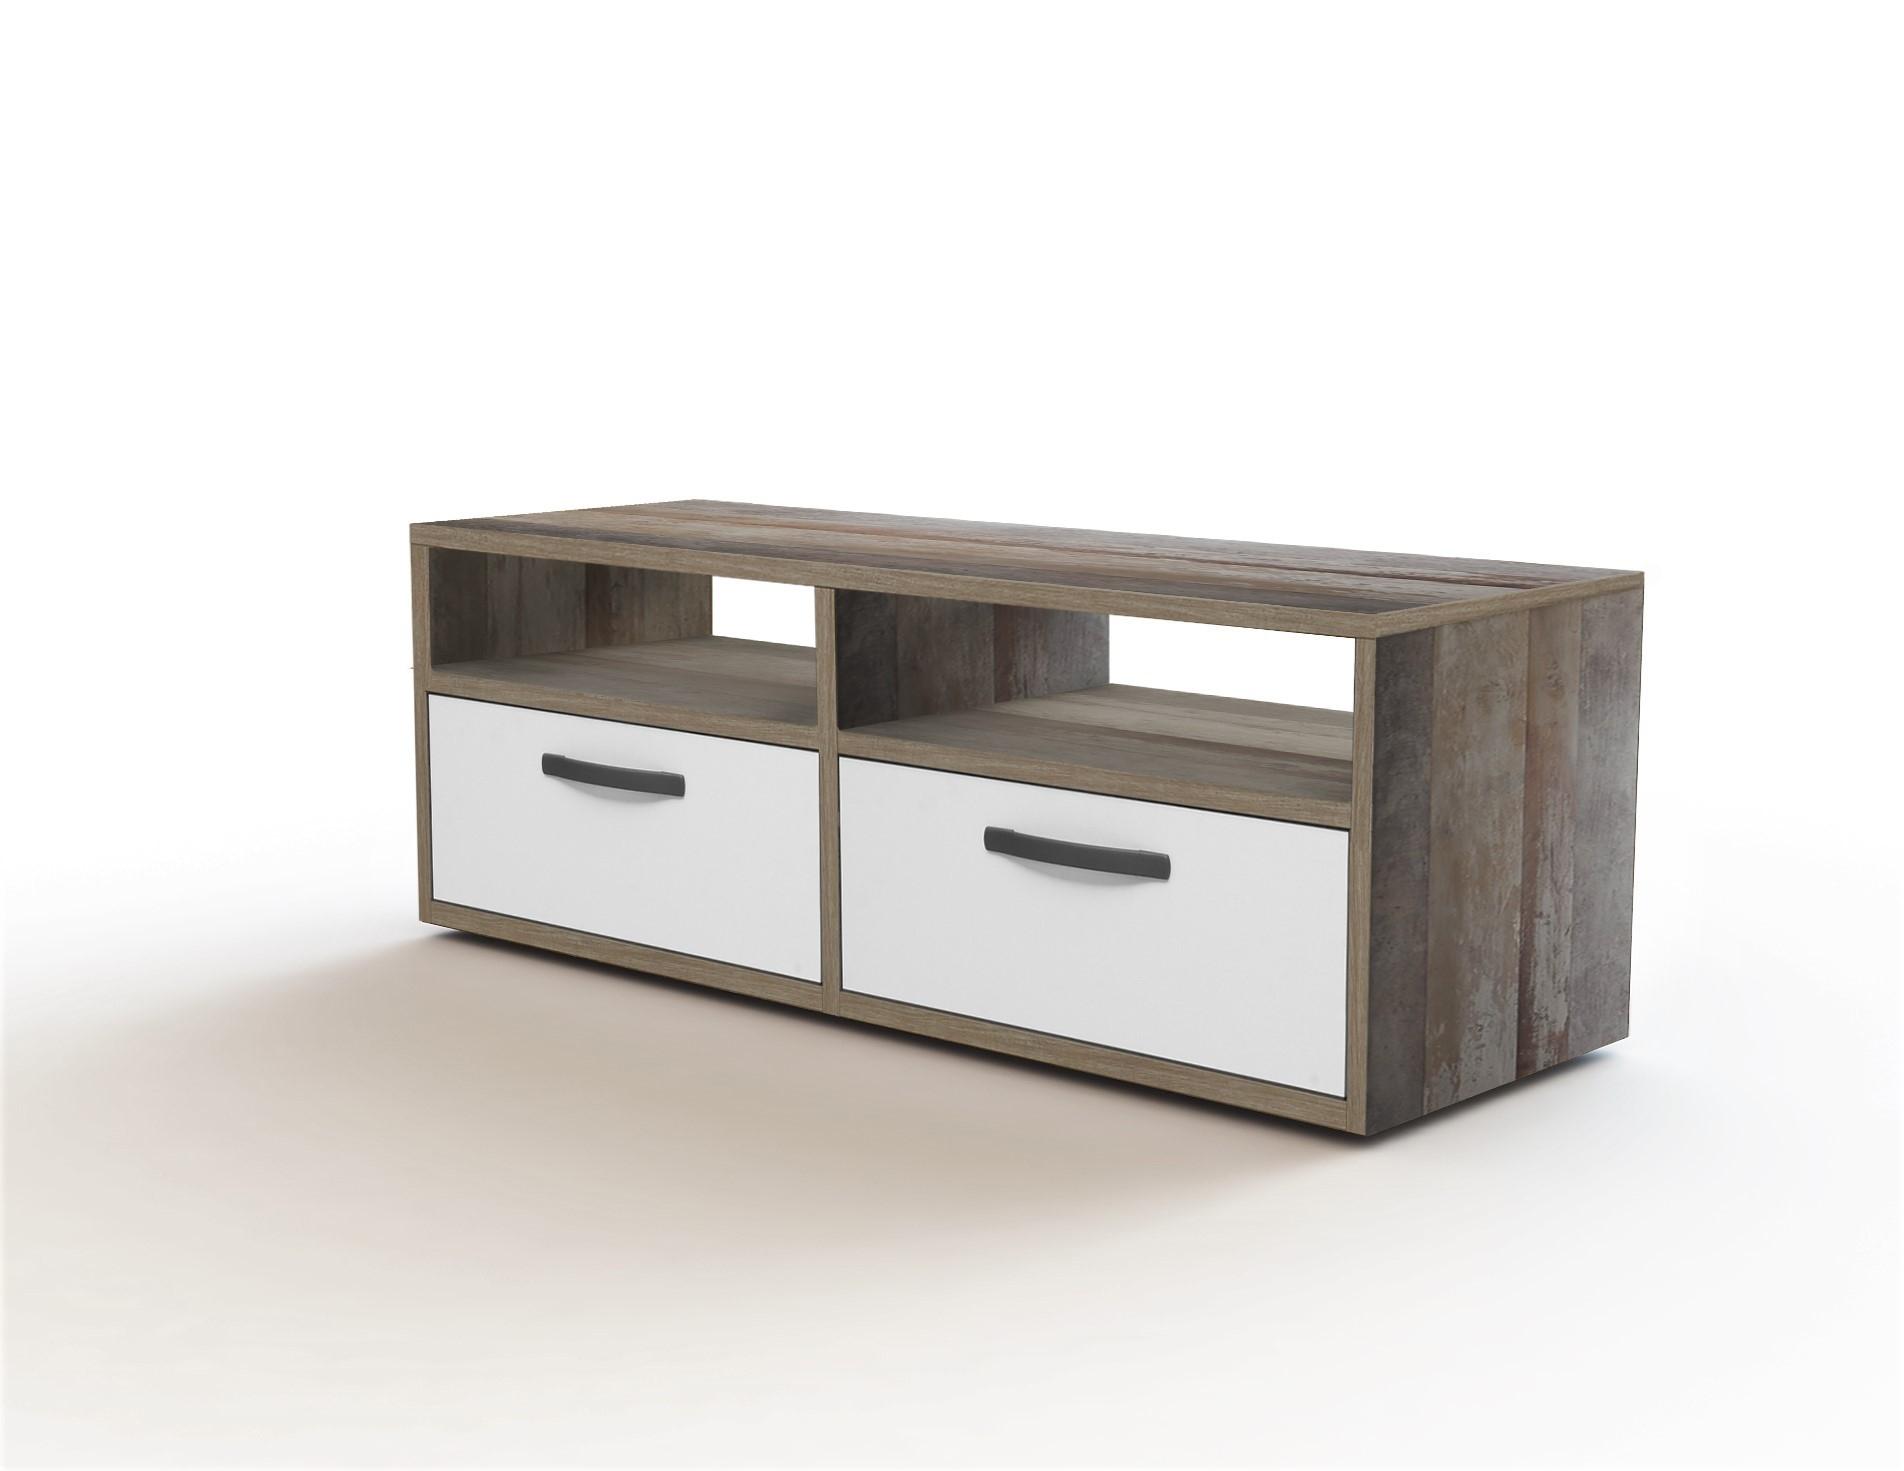 Comoda TV din pal, cu 2 sertare pentru copii Vicky II Alb / Driftwood, l120xA45,5xH45 cm somproduct.ro